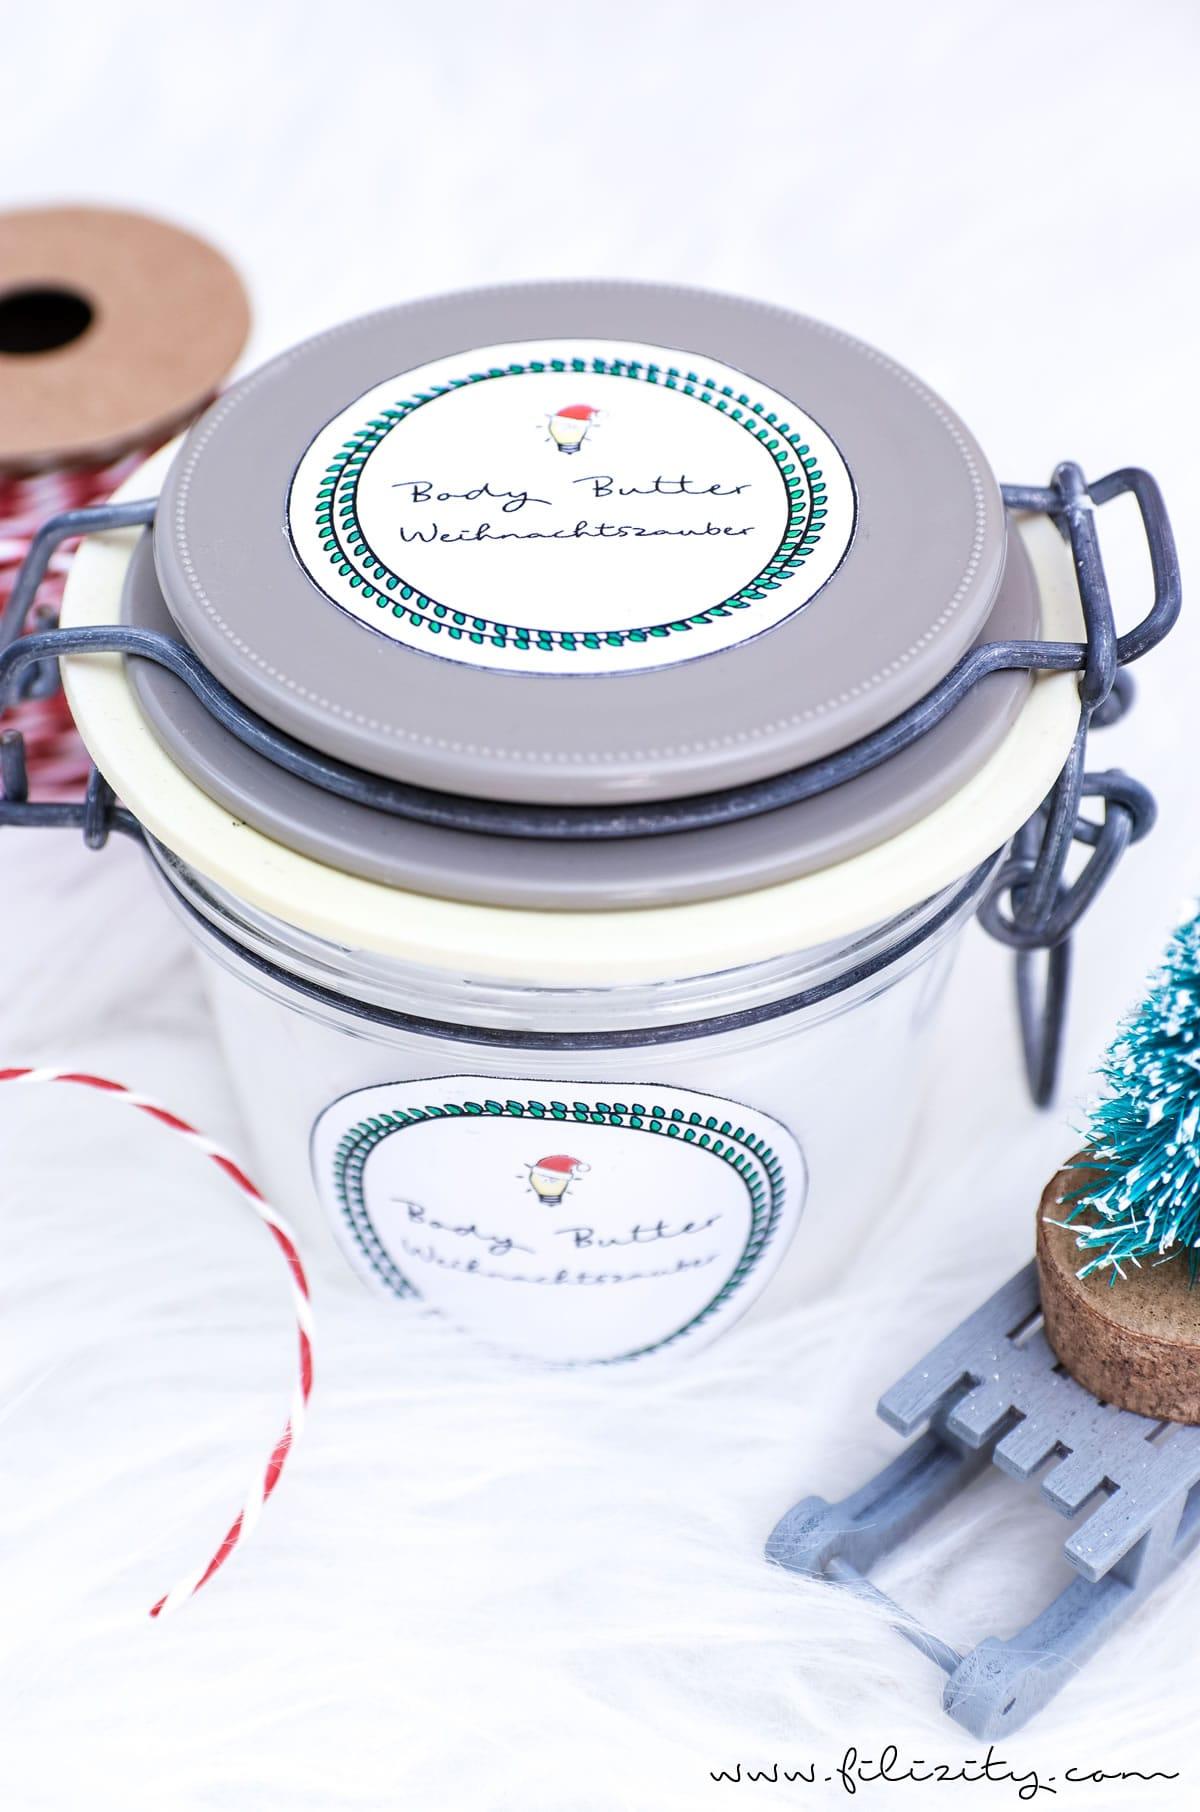 diy geschenkidee body butter selber machen beauty blog aus dem rheinland. Black Bedroom Furniture Sets. Home Design Ideas